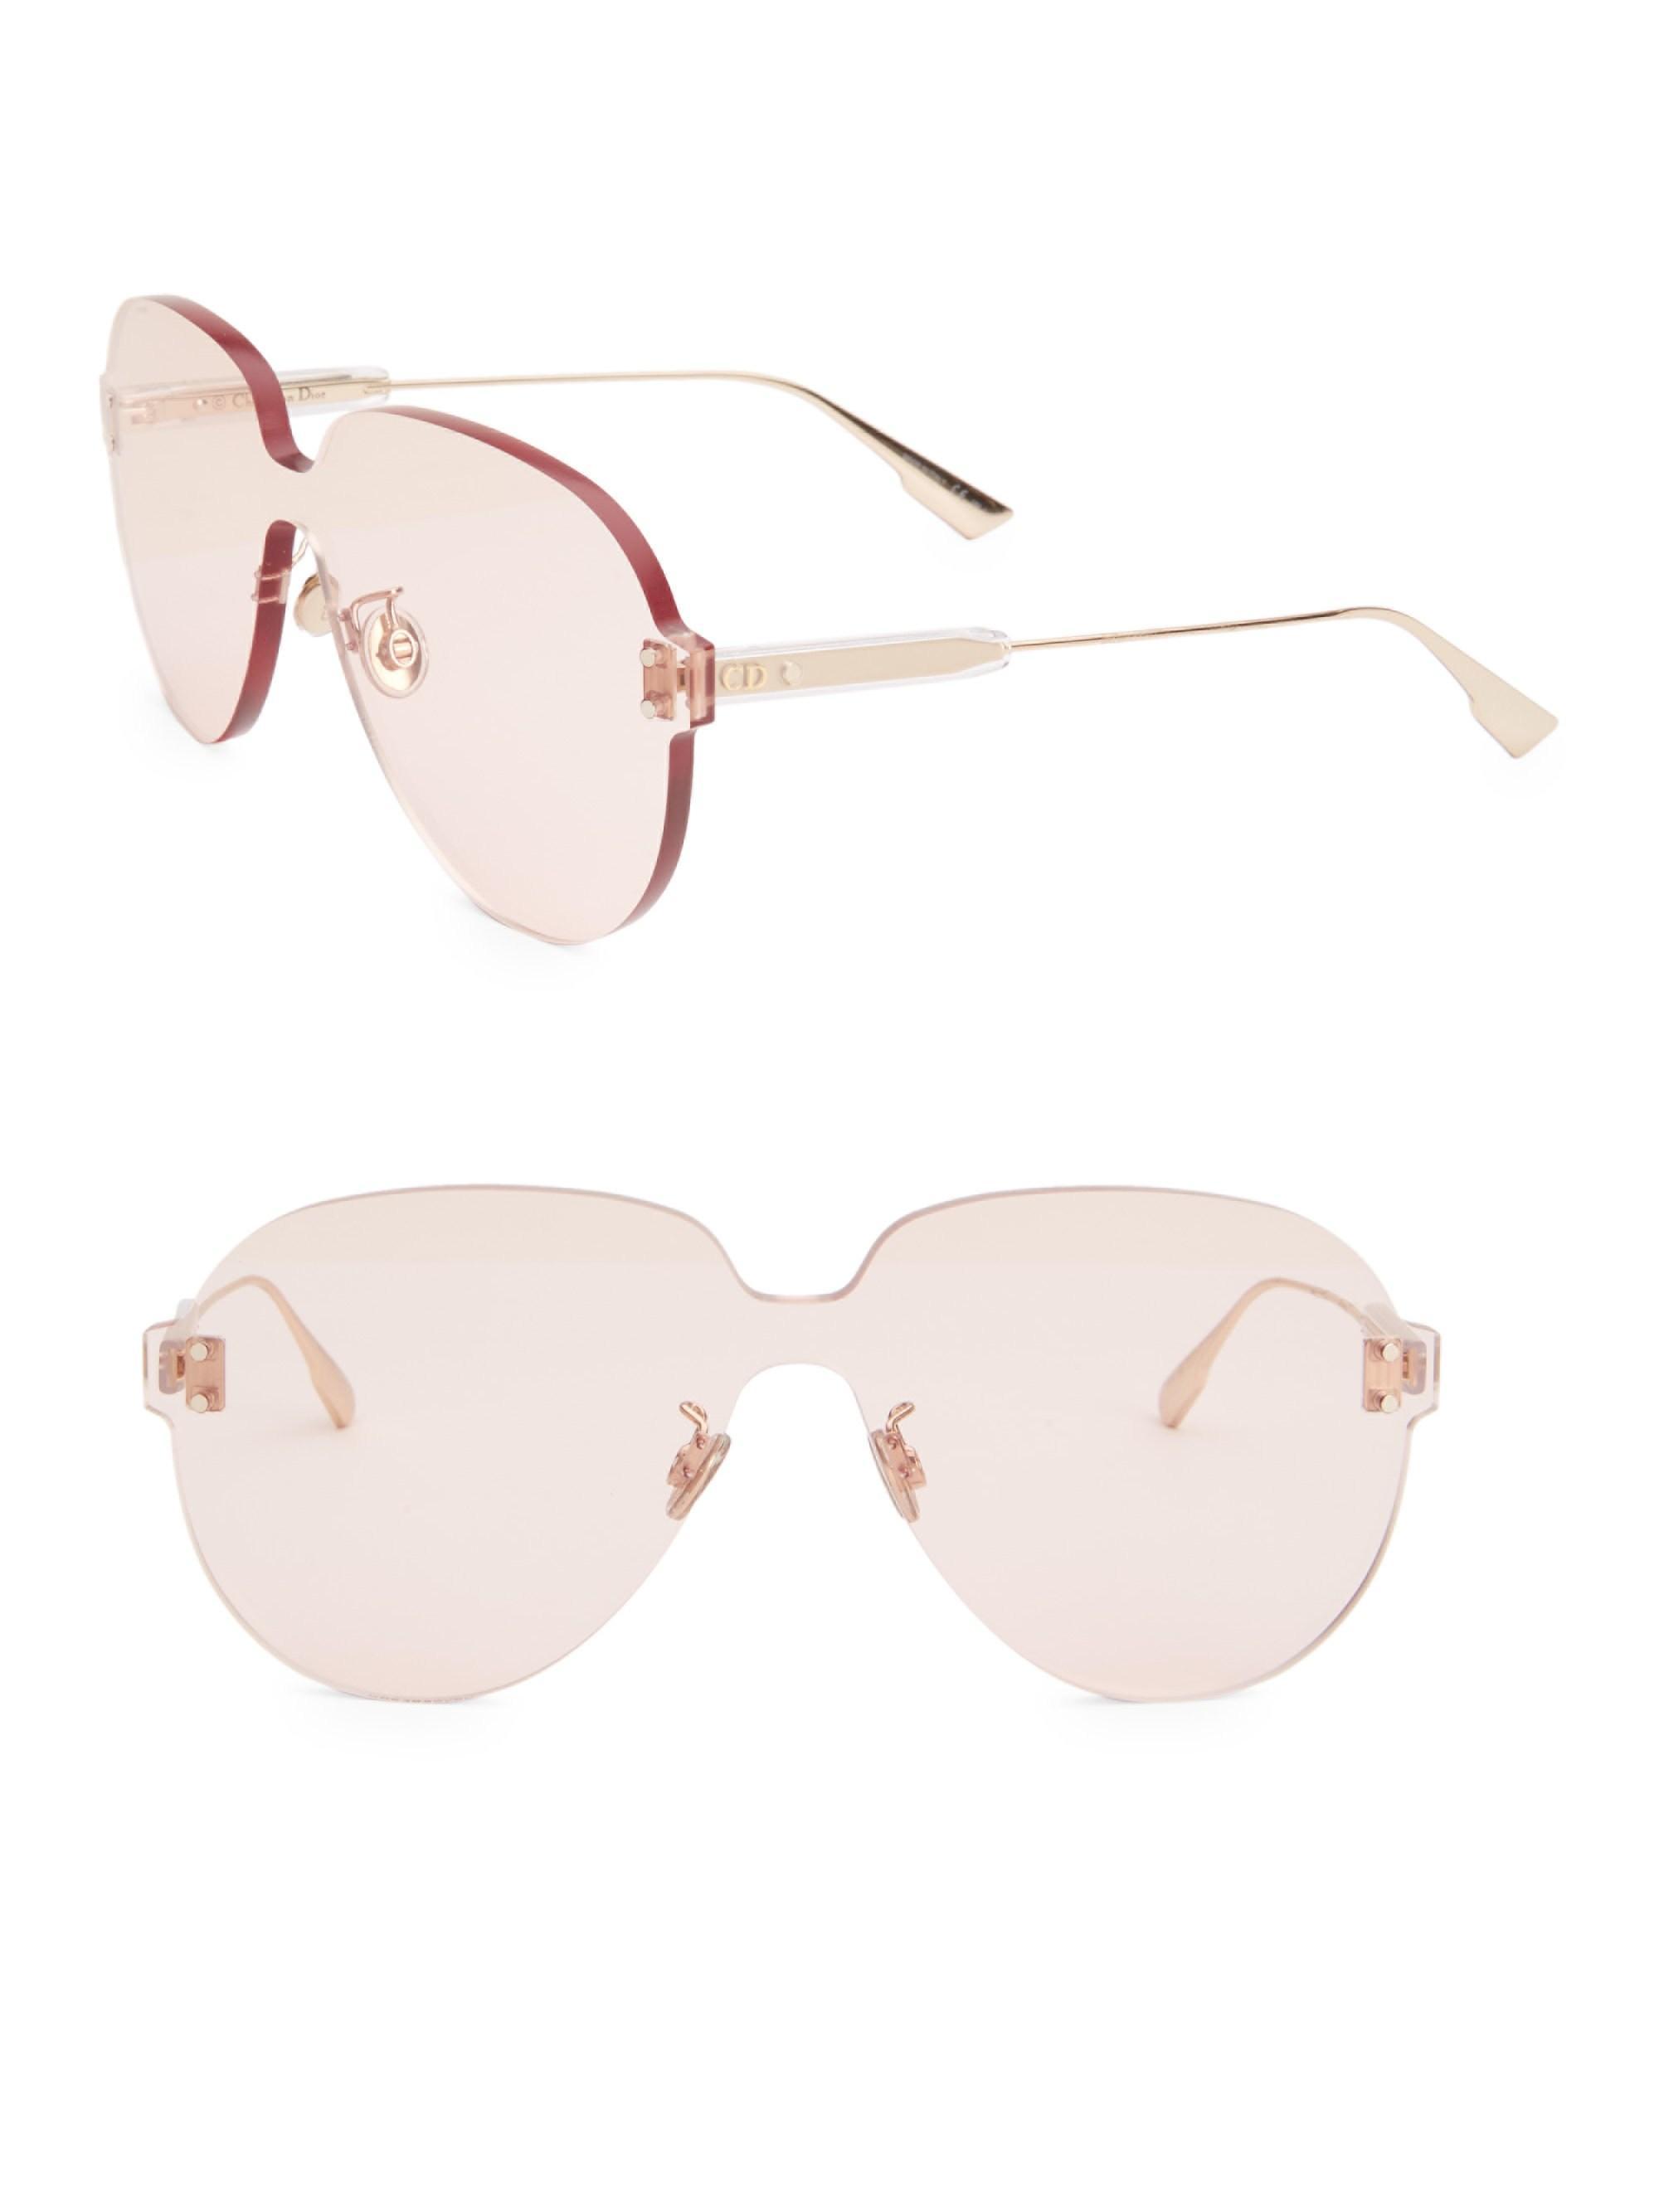 d25917398ee Lyst - Dior Women s Color Quake 3 99mm Aviator Shield Sunglasses ...